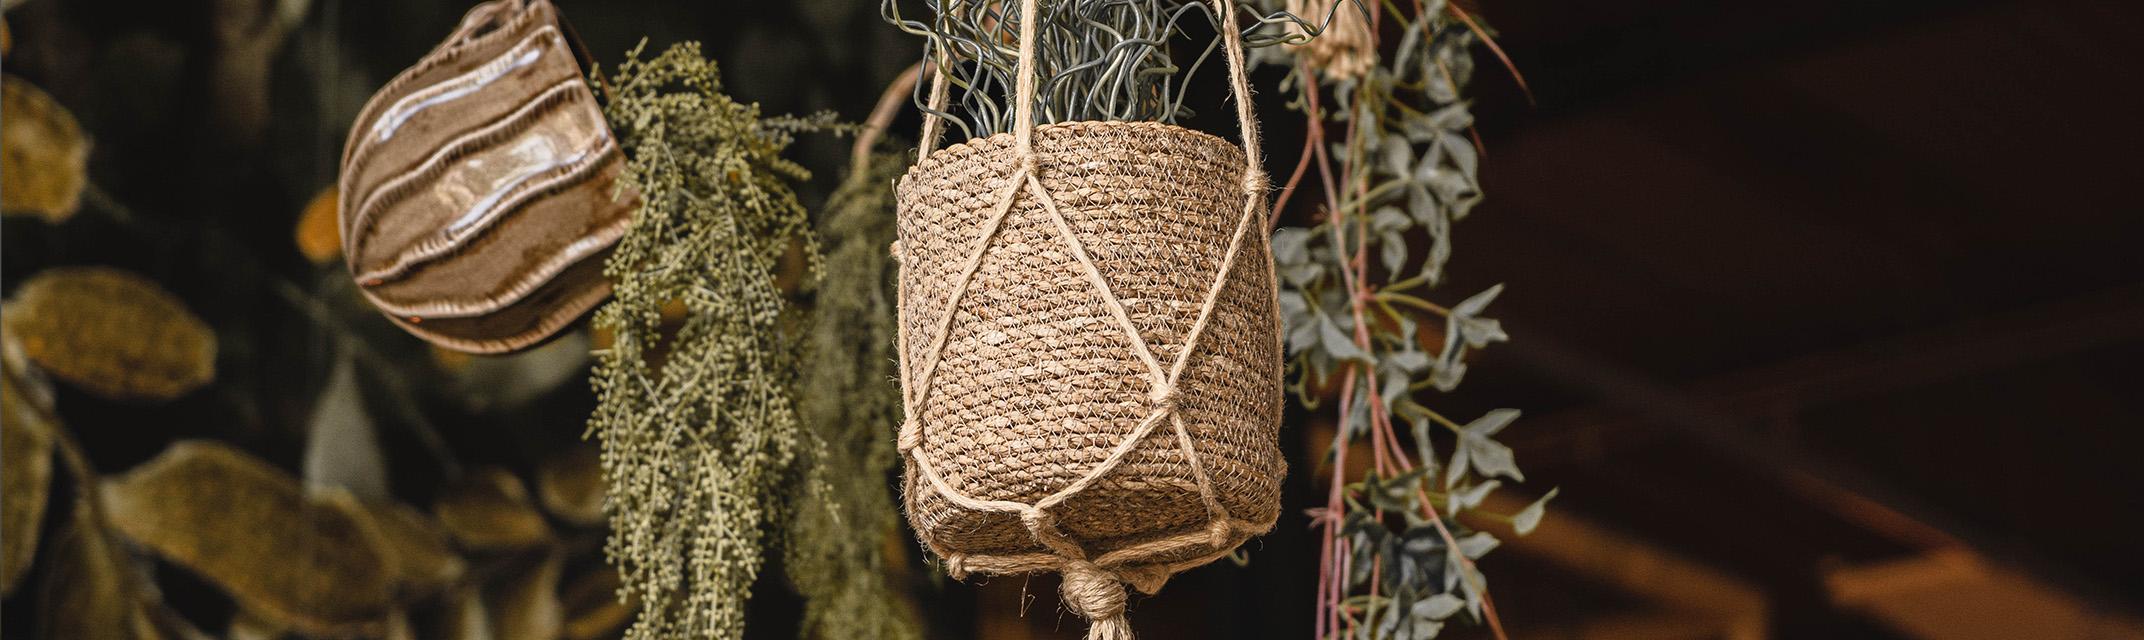 Plant hangers Spring/Summer